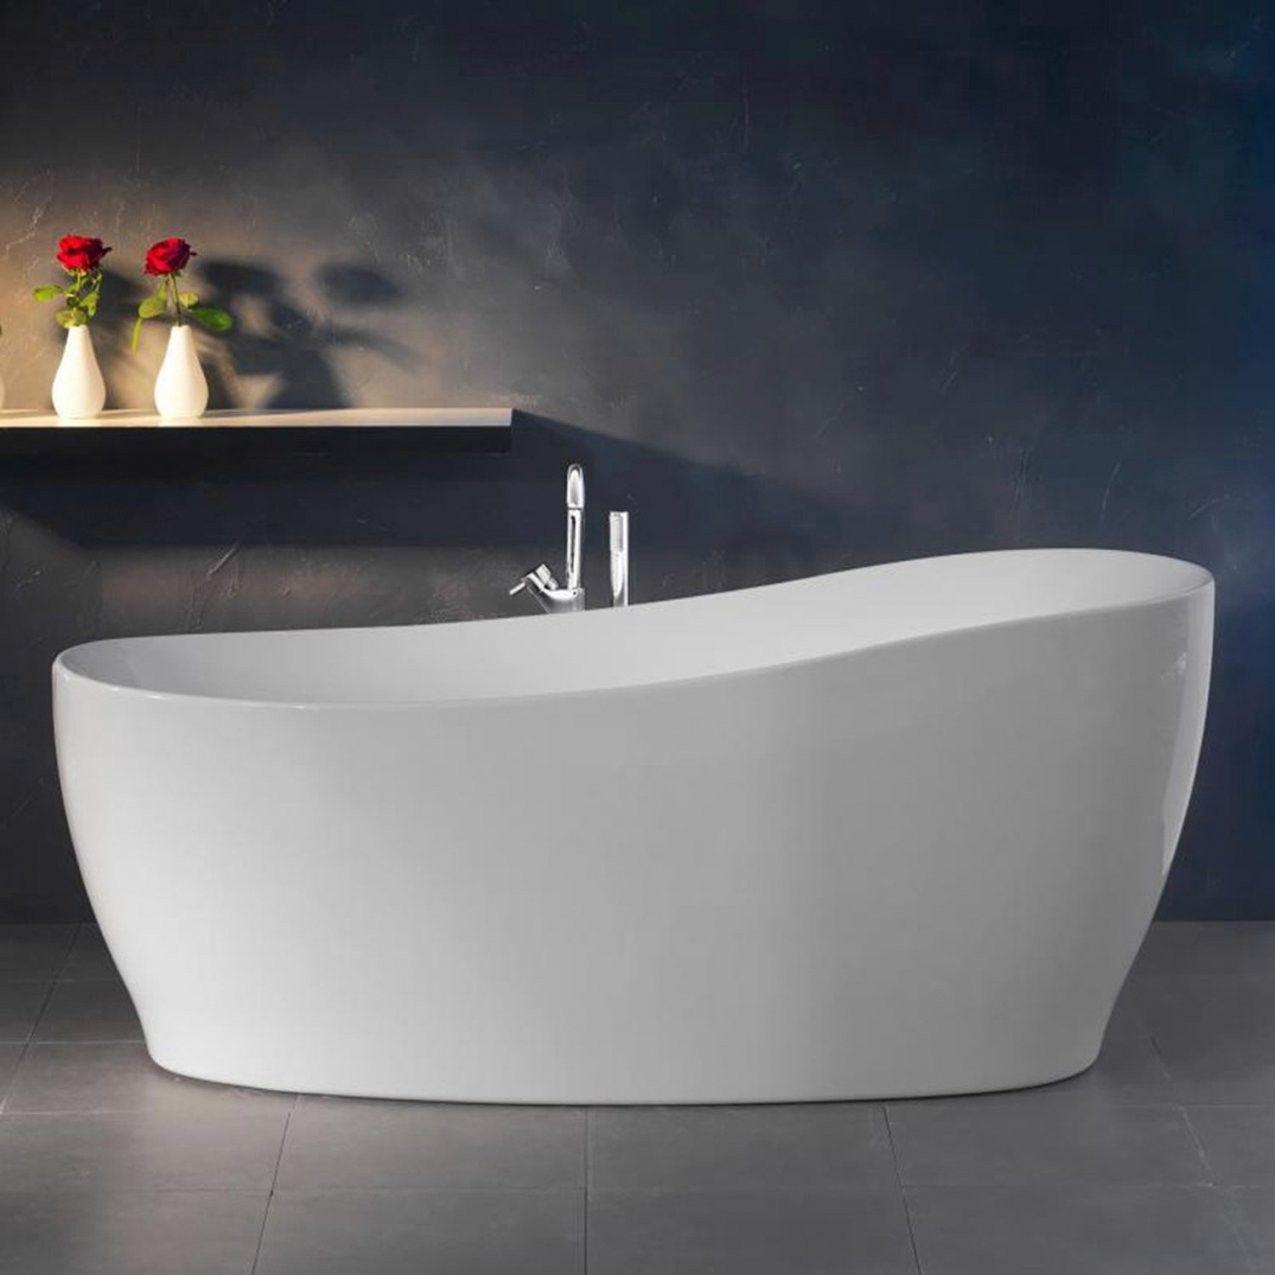 Freistehende Badewanne Aviva 180 Cm X 85 Cm Weiss Kaufen Bei Obi In 2020 Badewanne Ovale Badewanne Freistehende Badewanne